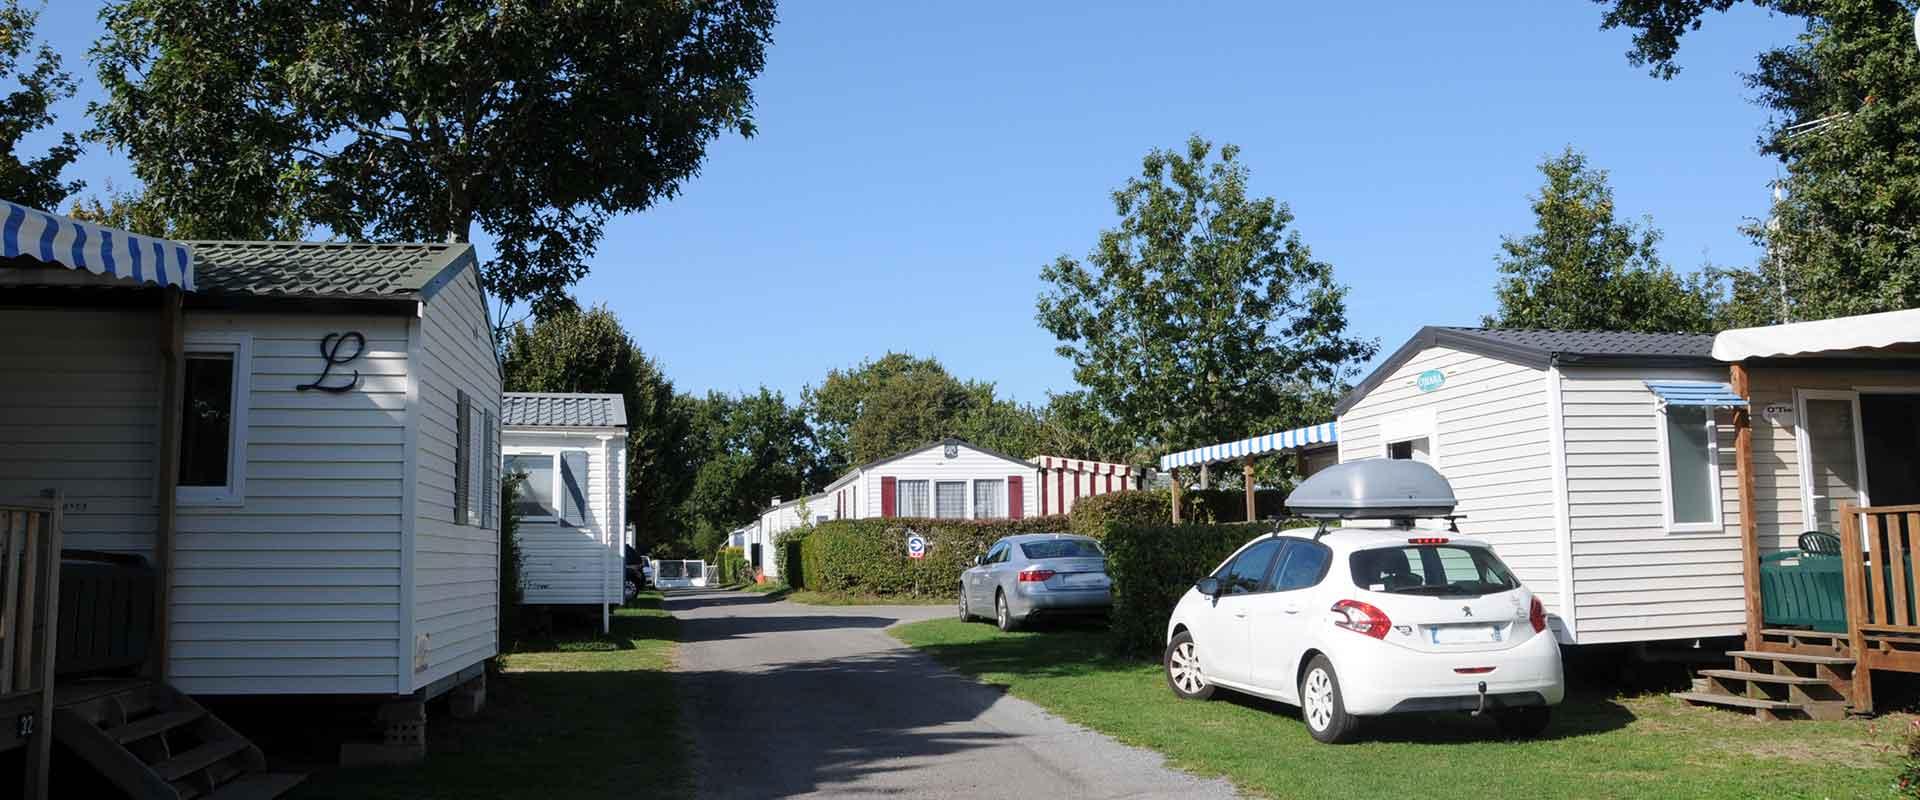 Camping Damgan Morbihan ᐃ La Blanche Hermine *** encequiconcerne Camping Damgan Avec Piscine